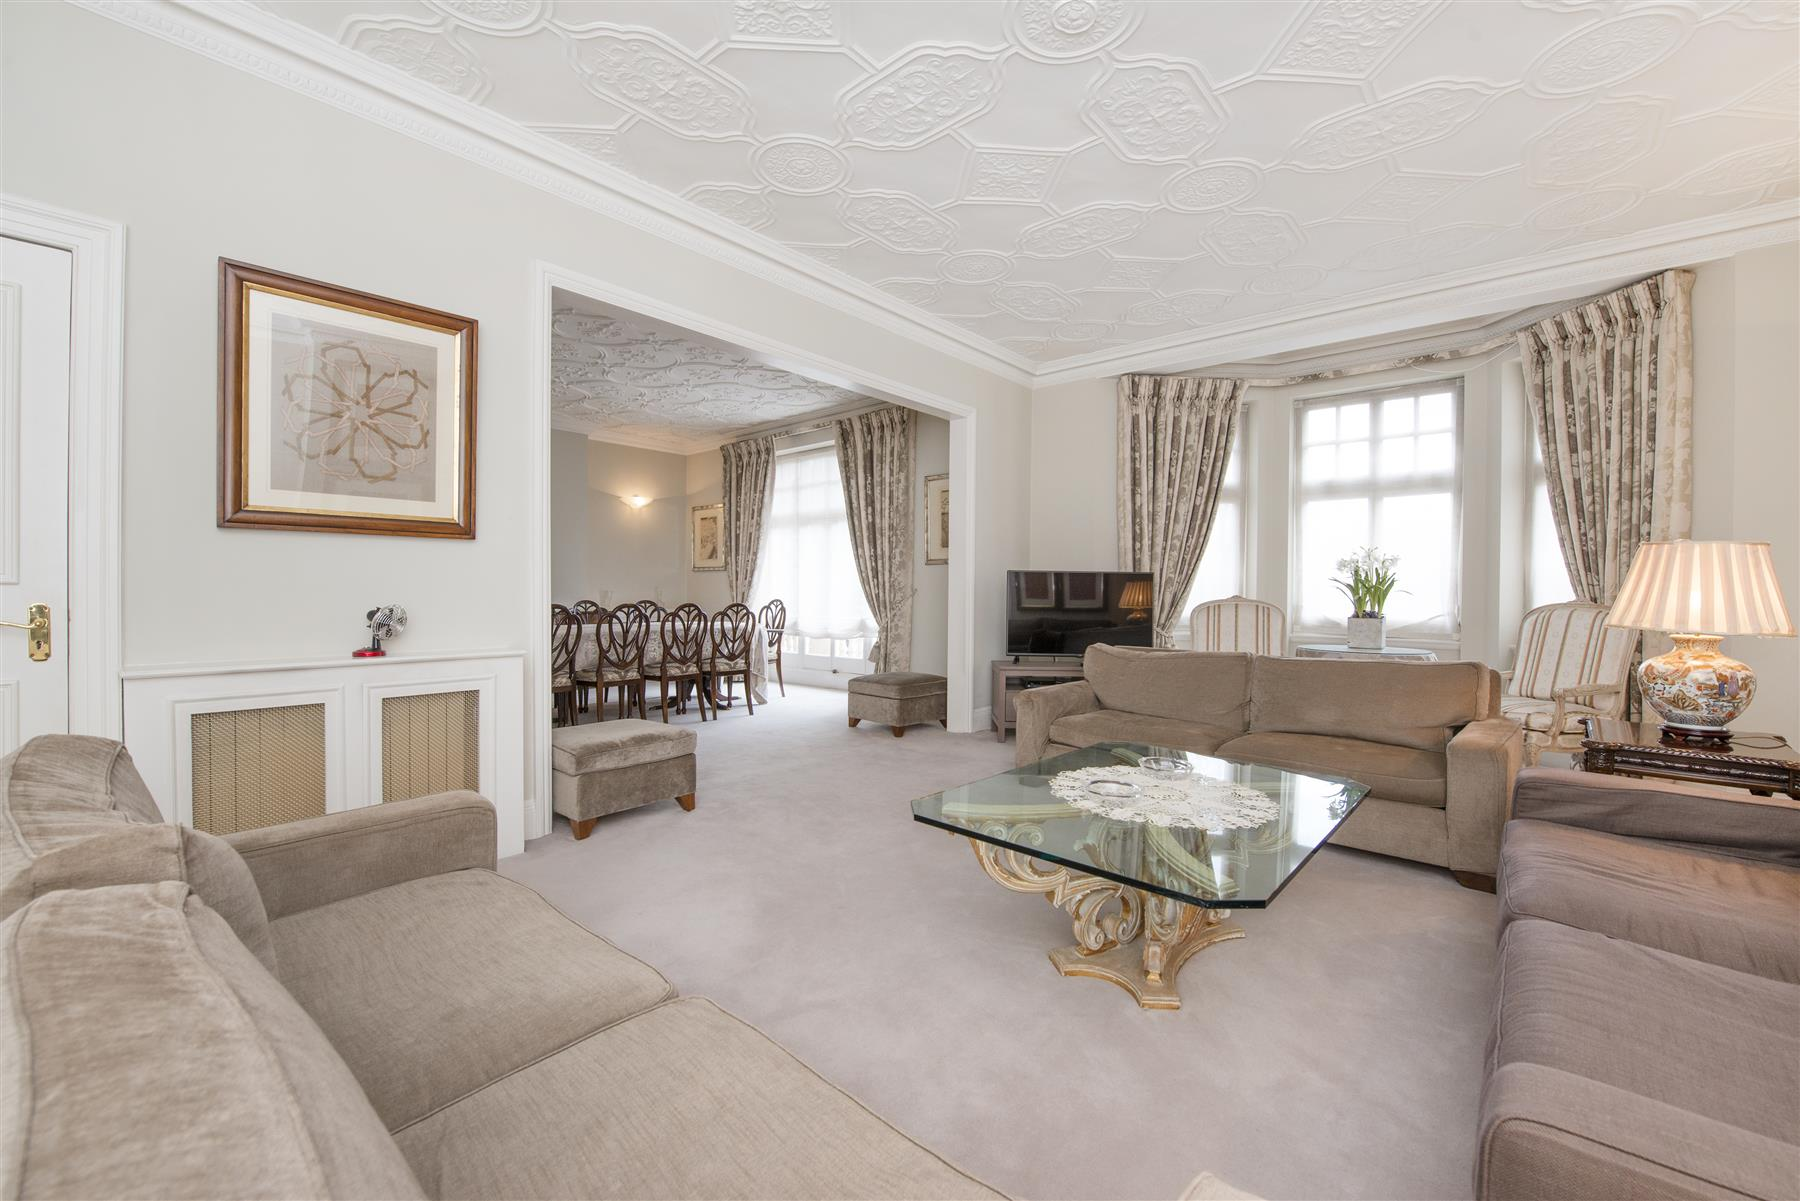 properties to rent 4 bedroom Apartment VALE COURT, MAIDA ...